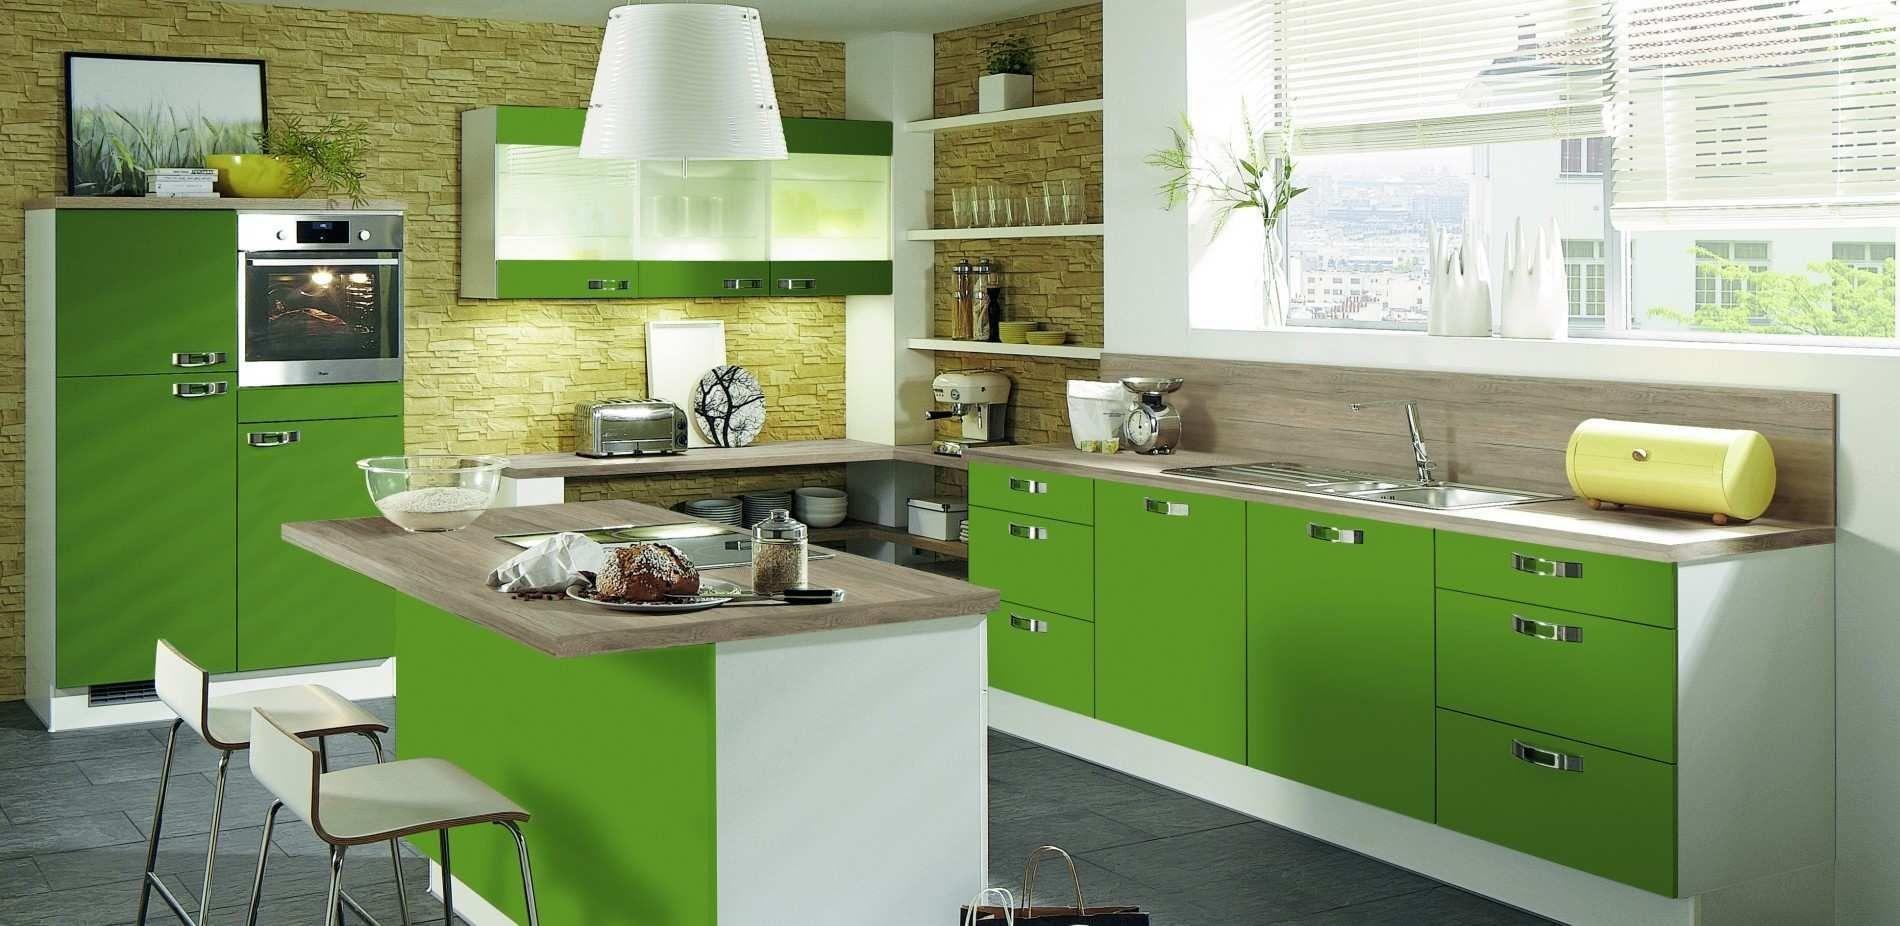 50 Keukens Duitsland Kleve Huis Ontwerp Ideeen Durchgehend Keuken Design Kleve